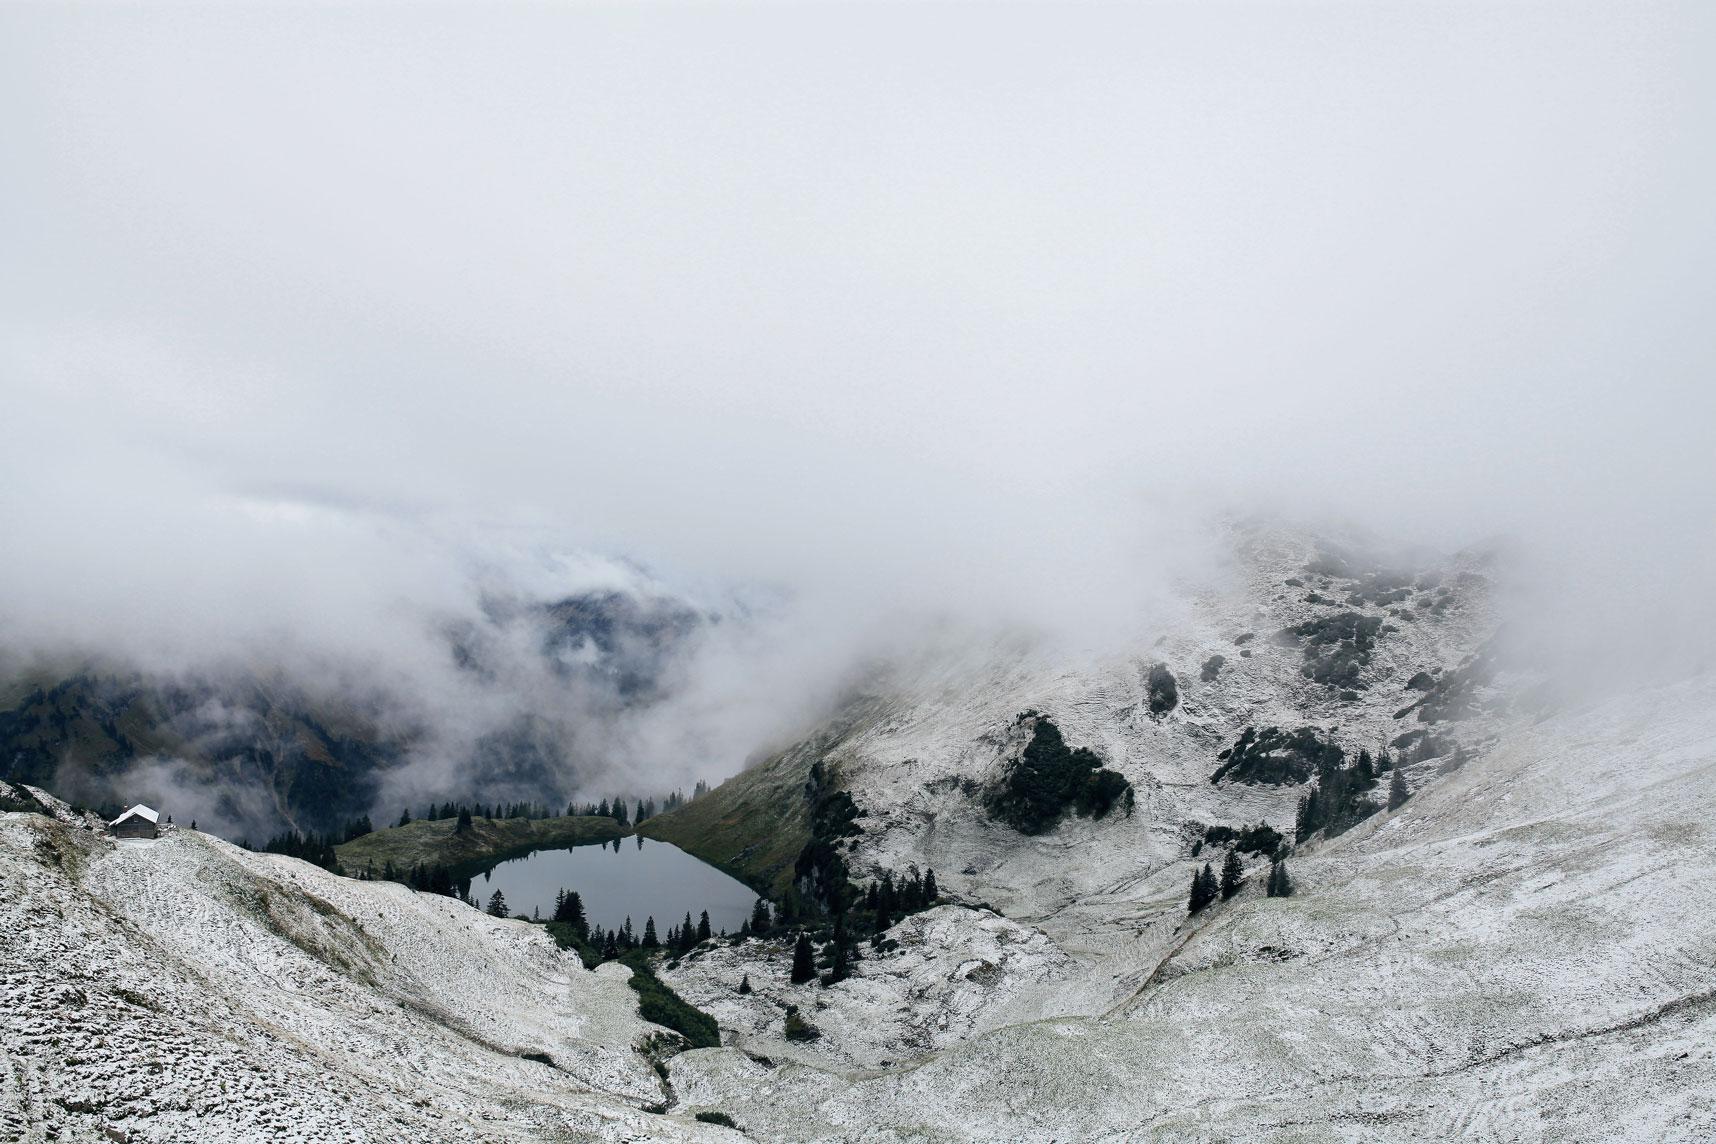 liz-kellerer-munichmountaingirls-winter-schoenste-bergseen-seealpsee